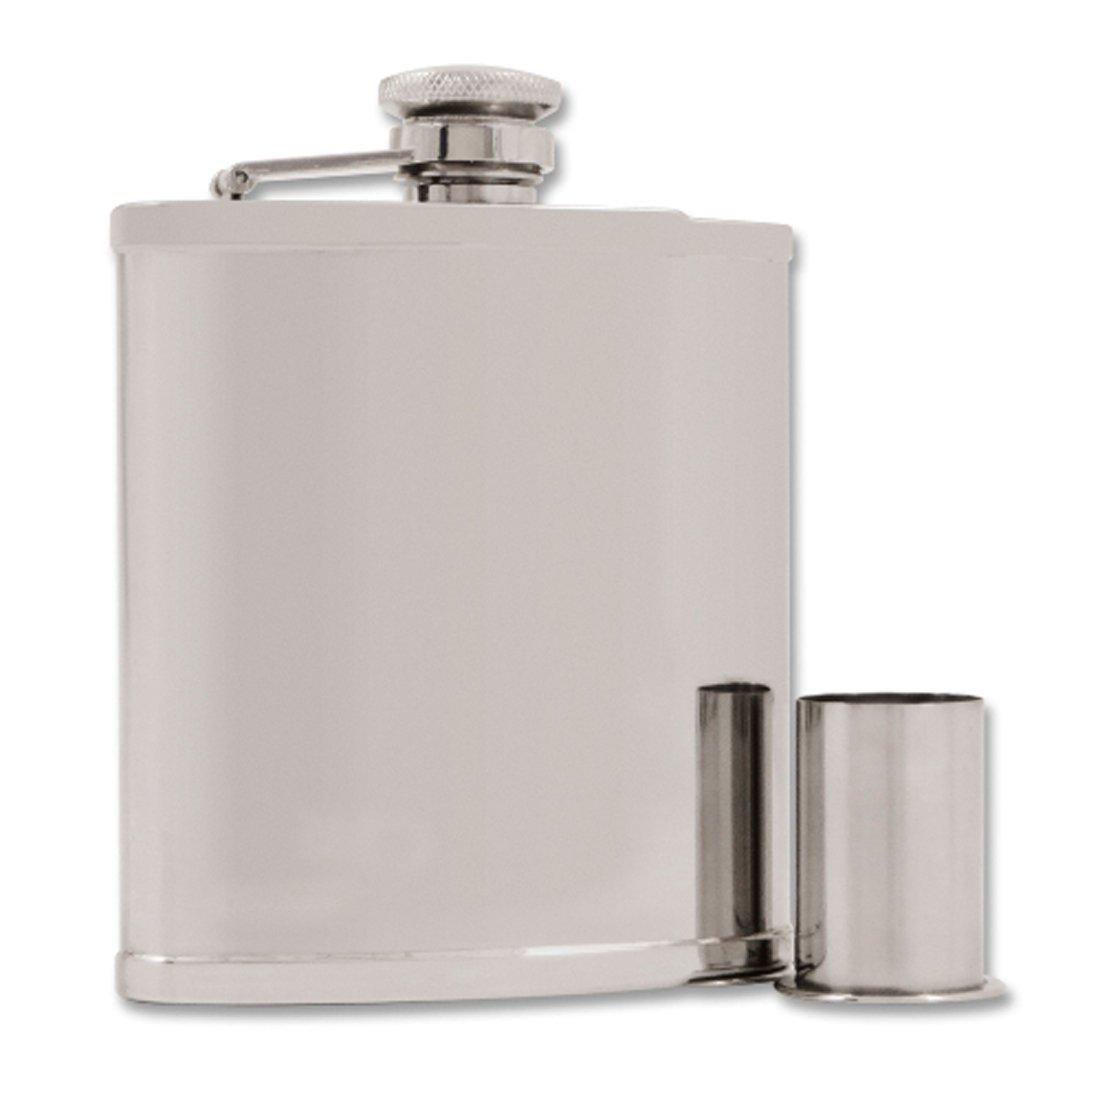 Taschenflasche / Flachmann Edelstahl verchromt inkl. 2 Becher integriert